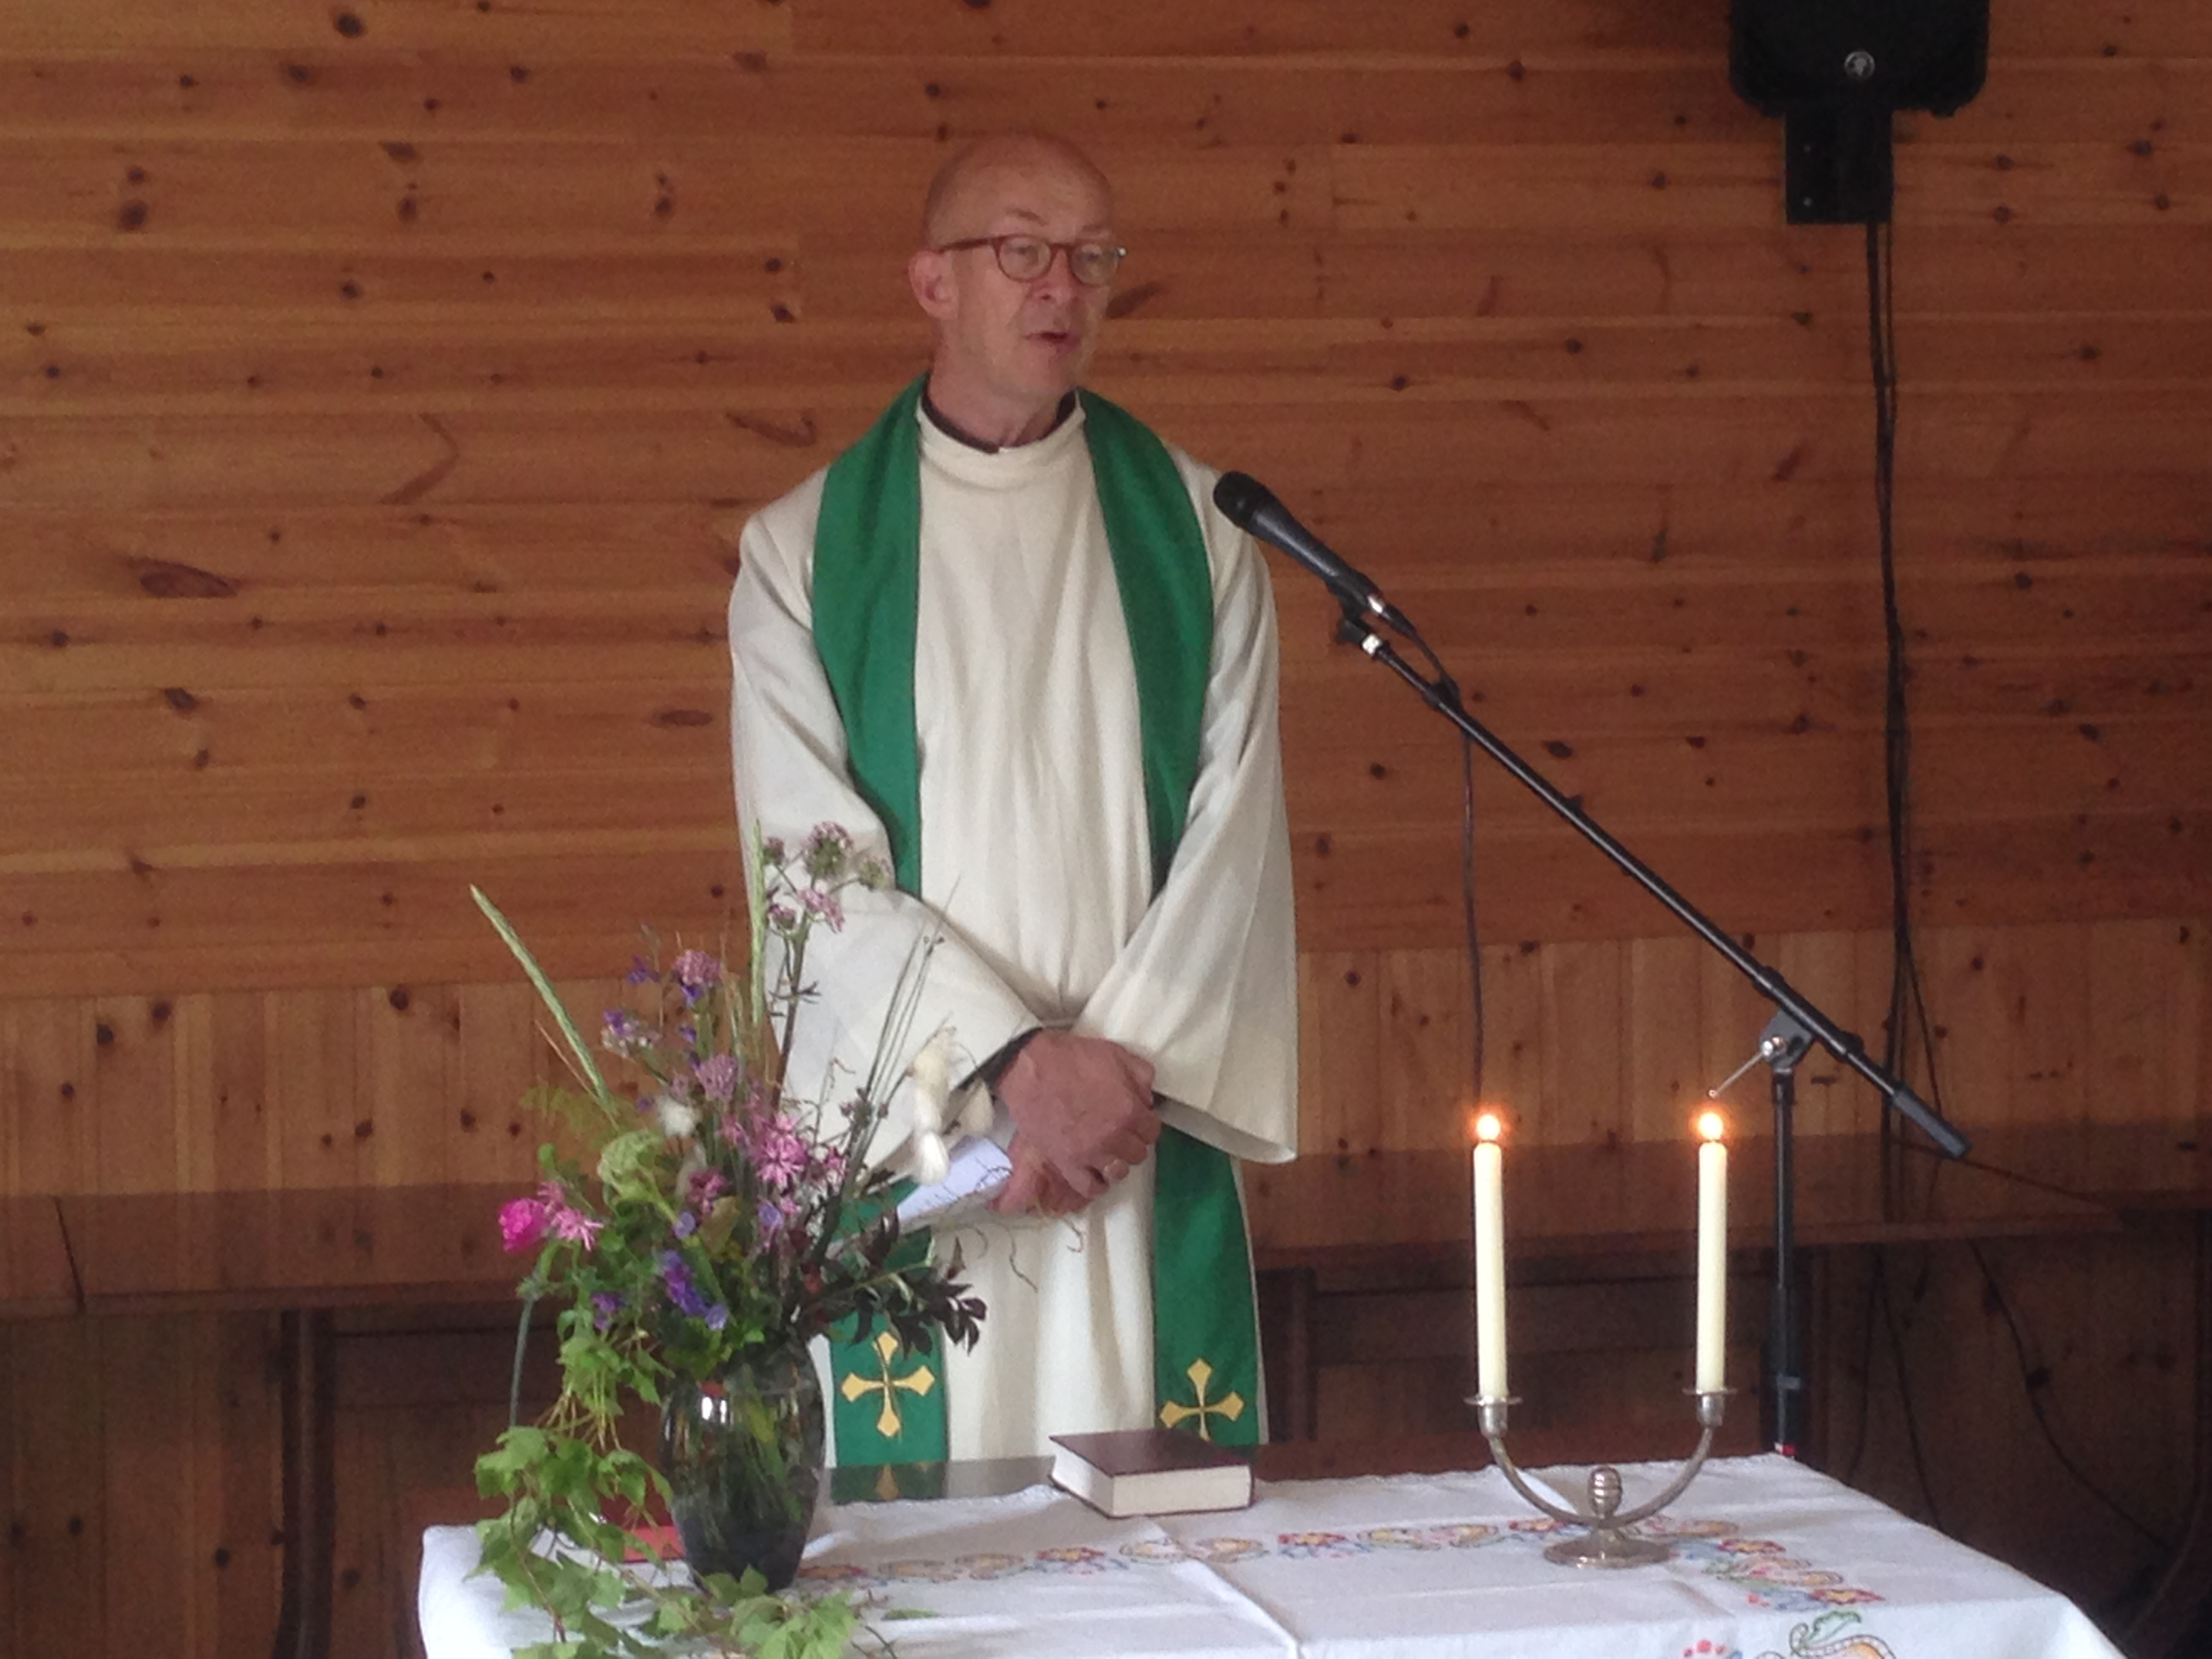 Gudstjeneste - Prest Jon Aalborg